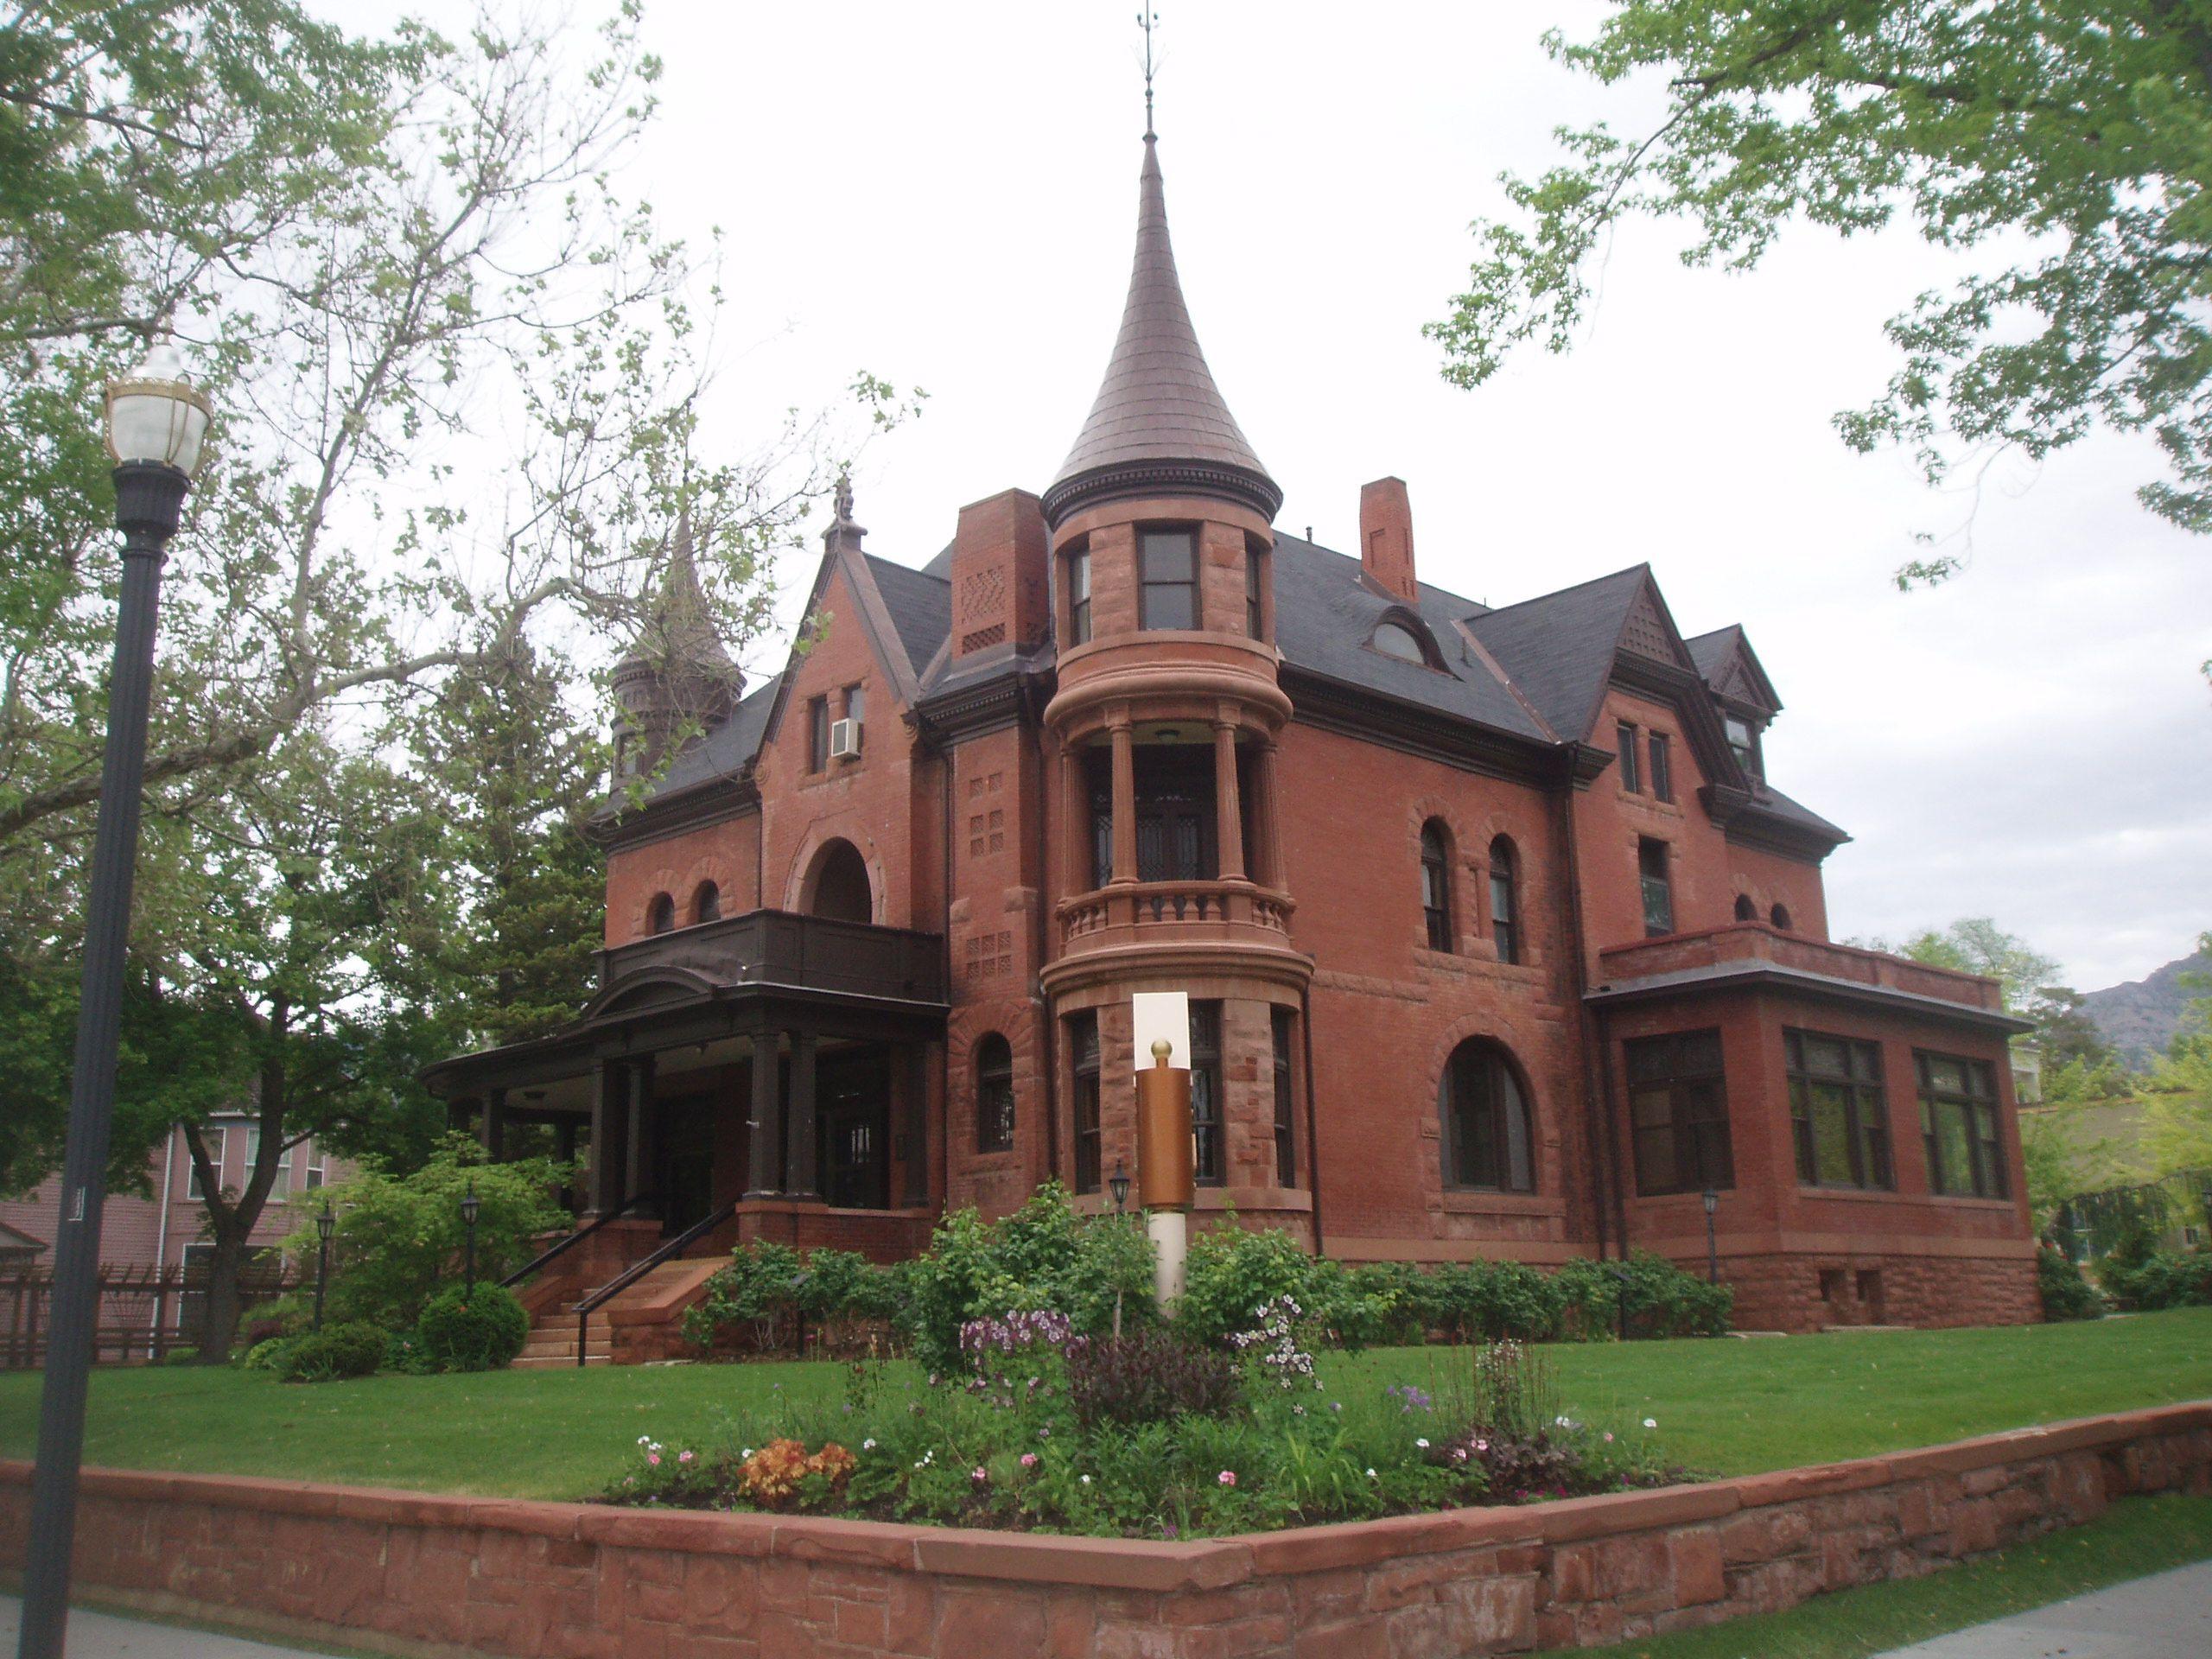 Jefferson Avenue Historic District Ogden Utah Wikipedia The